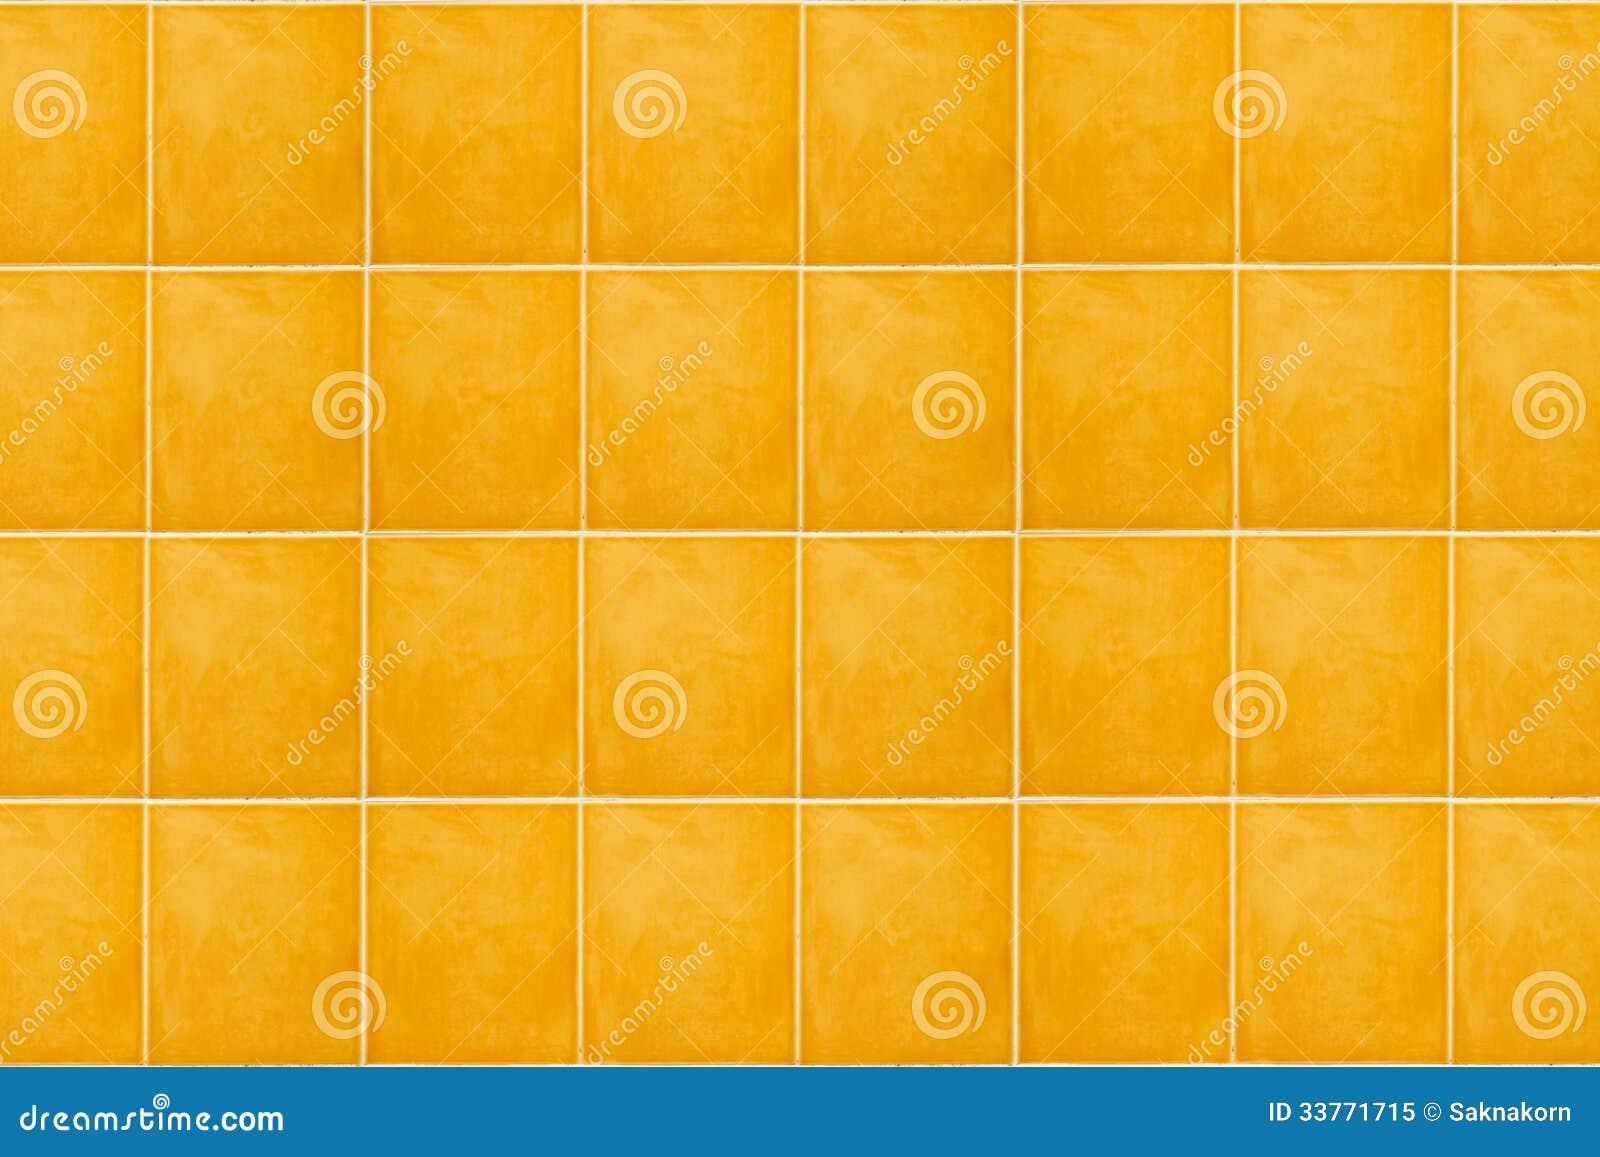 seamless tile royalty free stock photo image 33771715 New Orleans Fleur De Lys Cow Head Clip Art